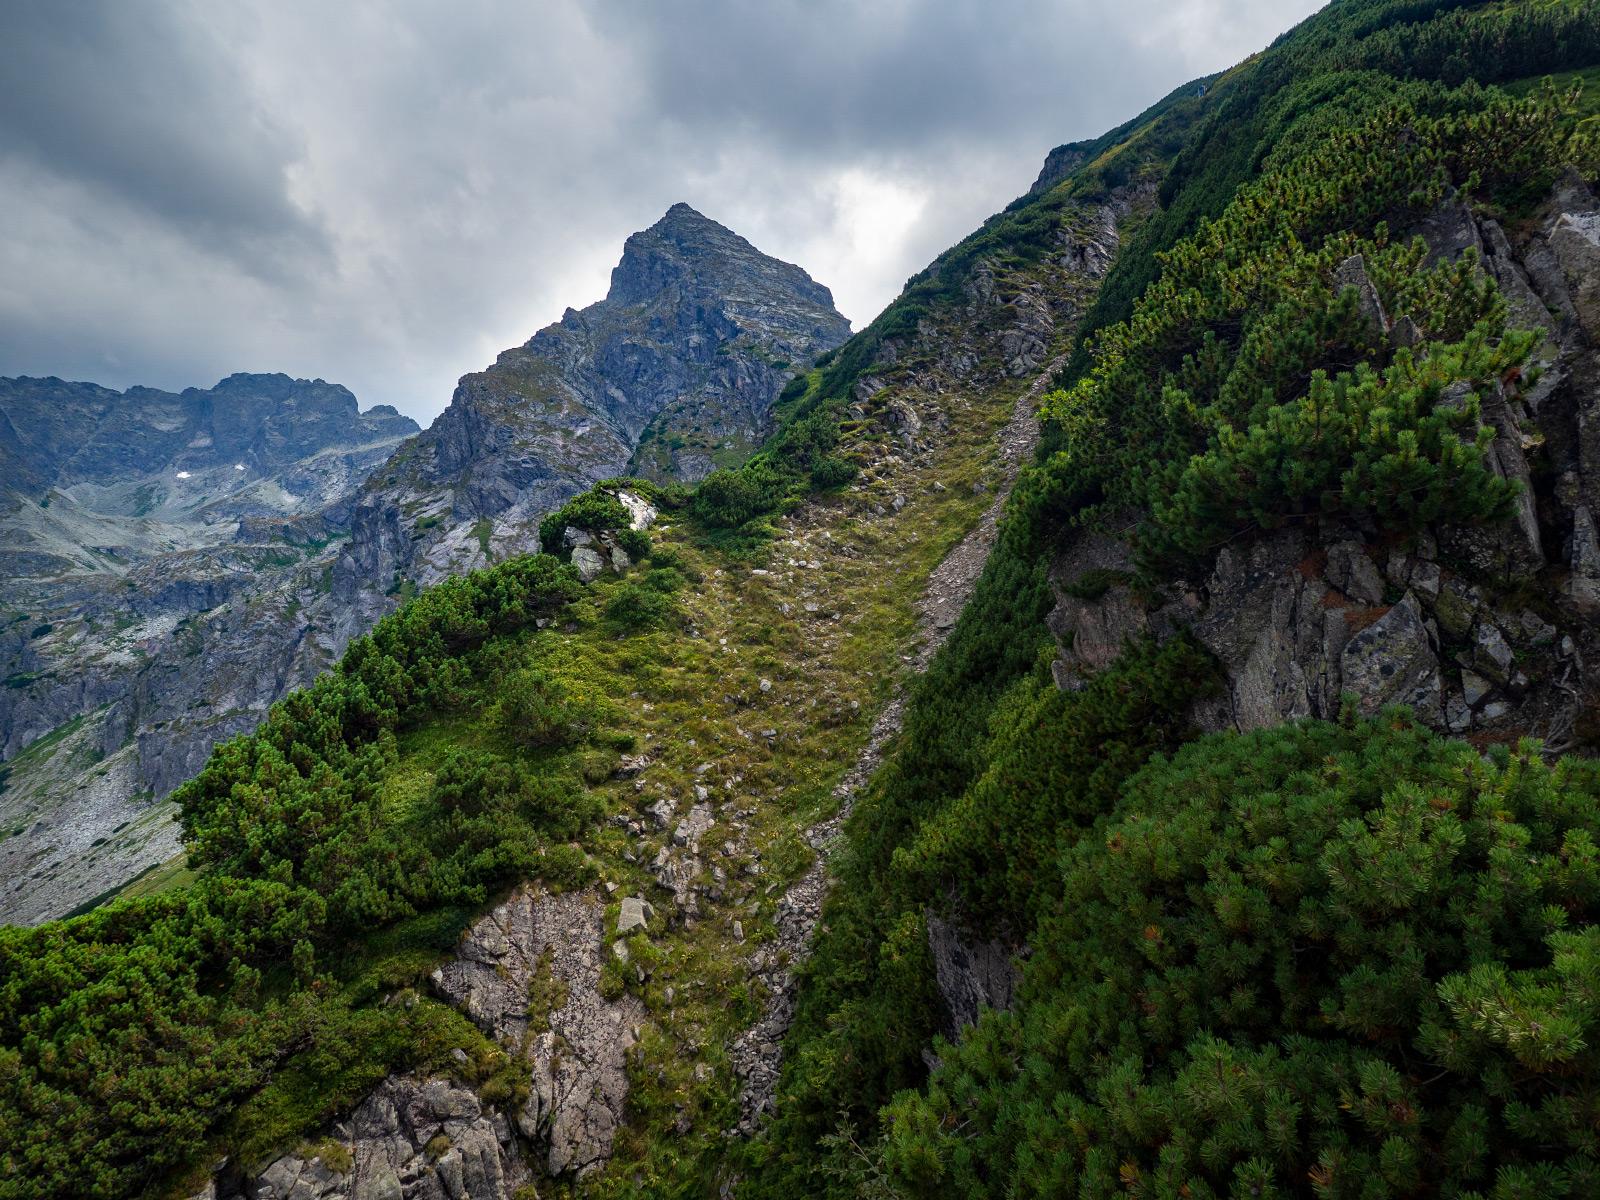 Nature in the Tatra Mountains, Mały Kościelec